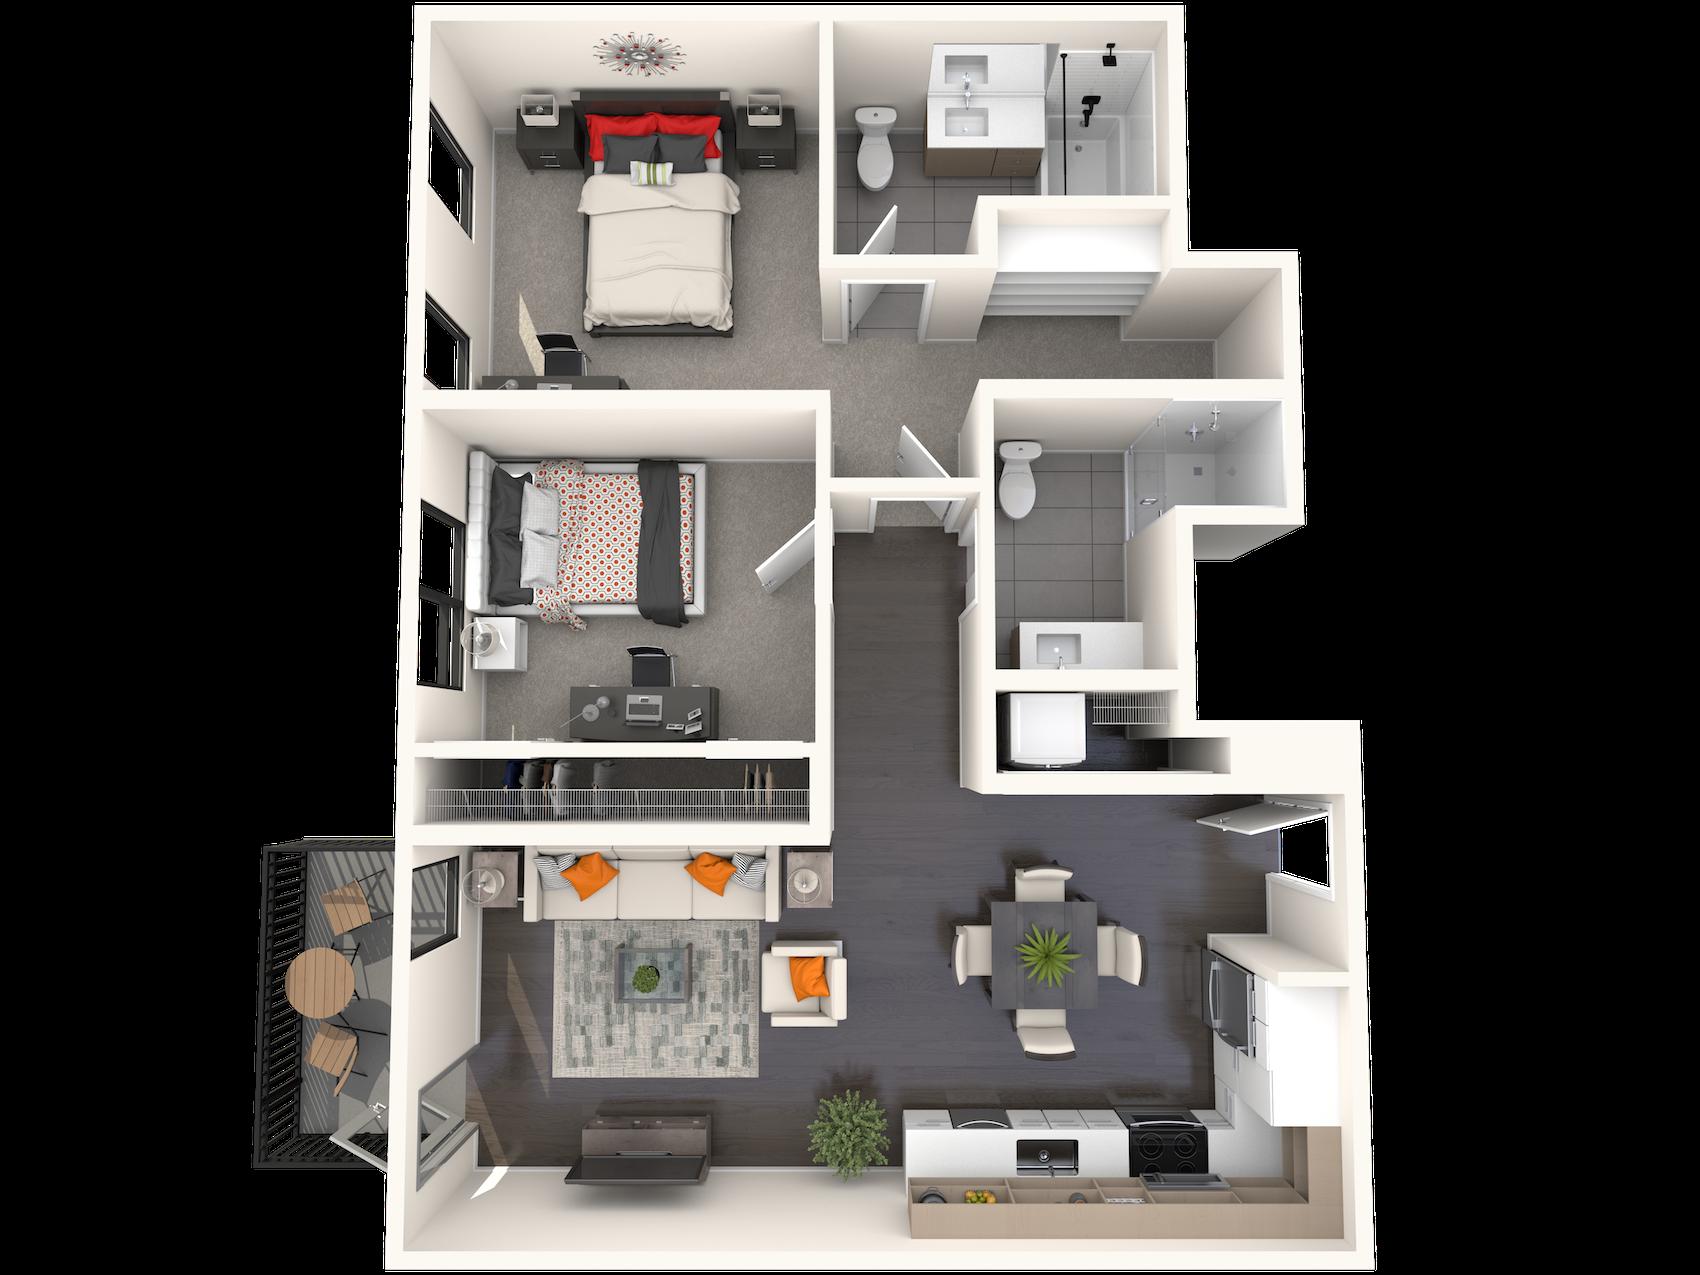 B2.3 Floor Plan